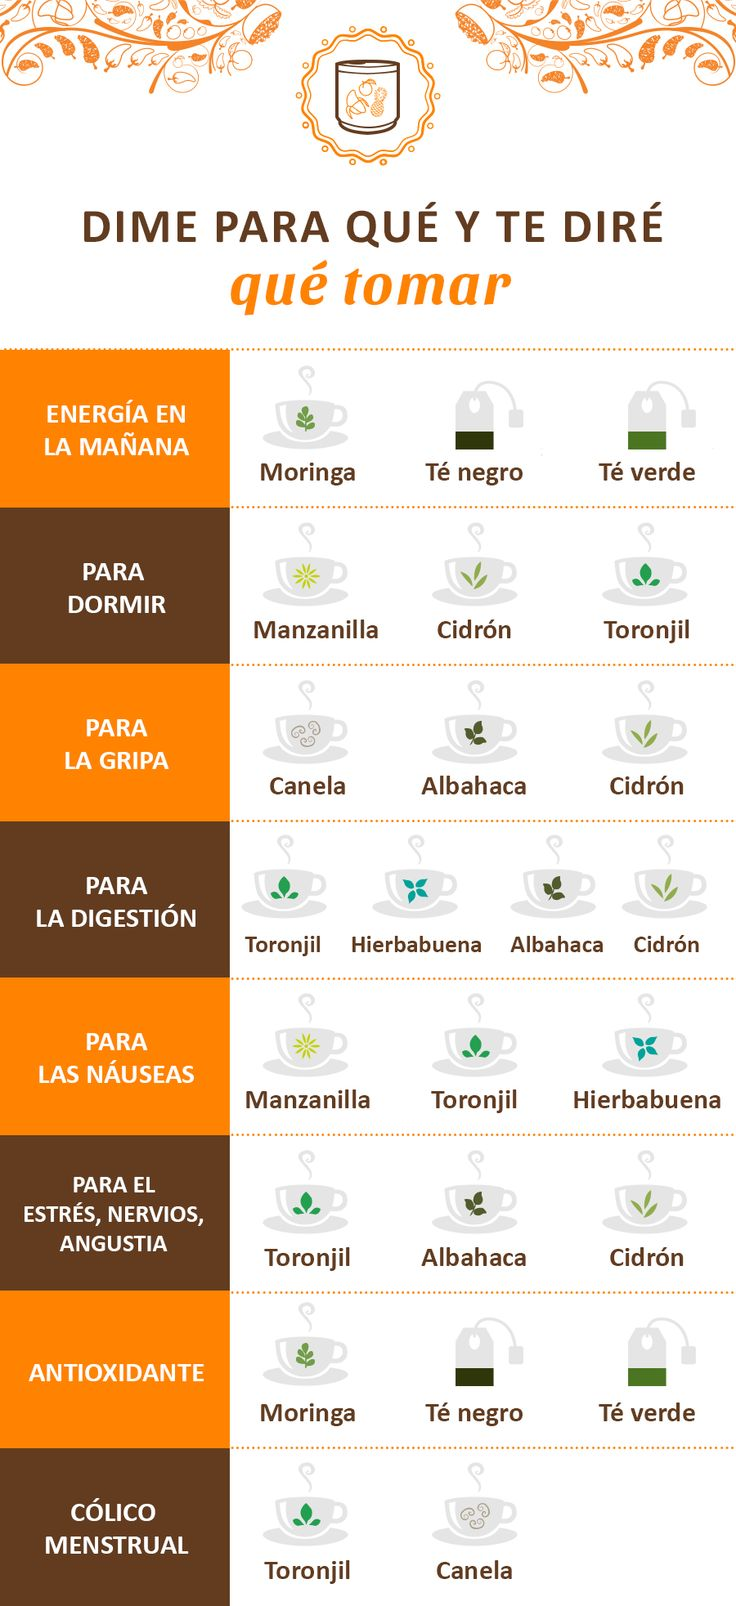 Cada té tiene beneficios para ti, conócelos aquí: